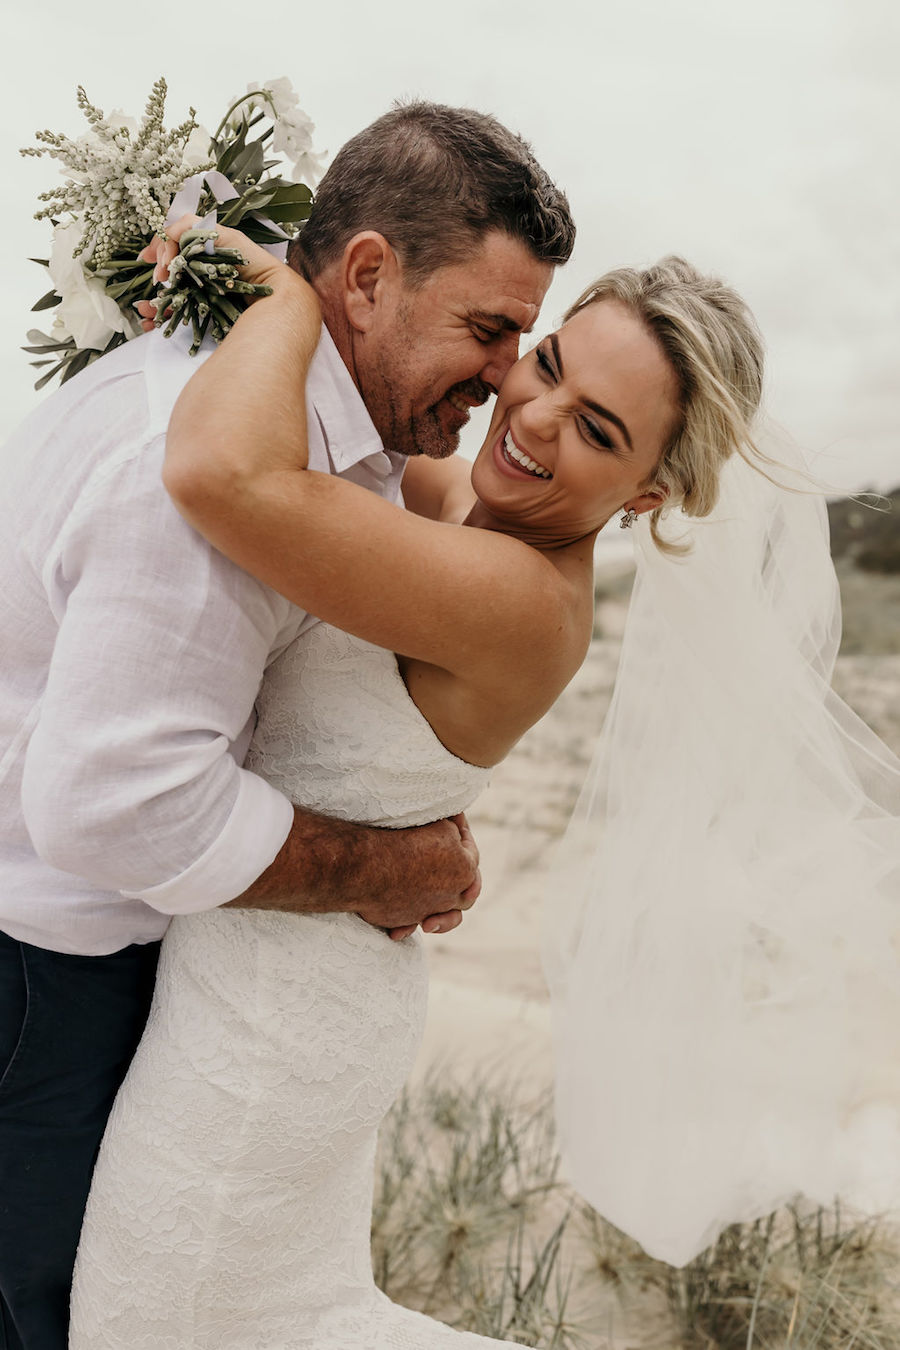 tweed-coast-weddings-wedding-venue-osteria-casuarina-ceremony-reception-5T1A8051.jpg